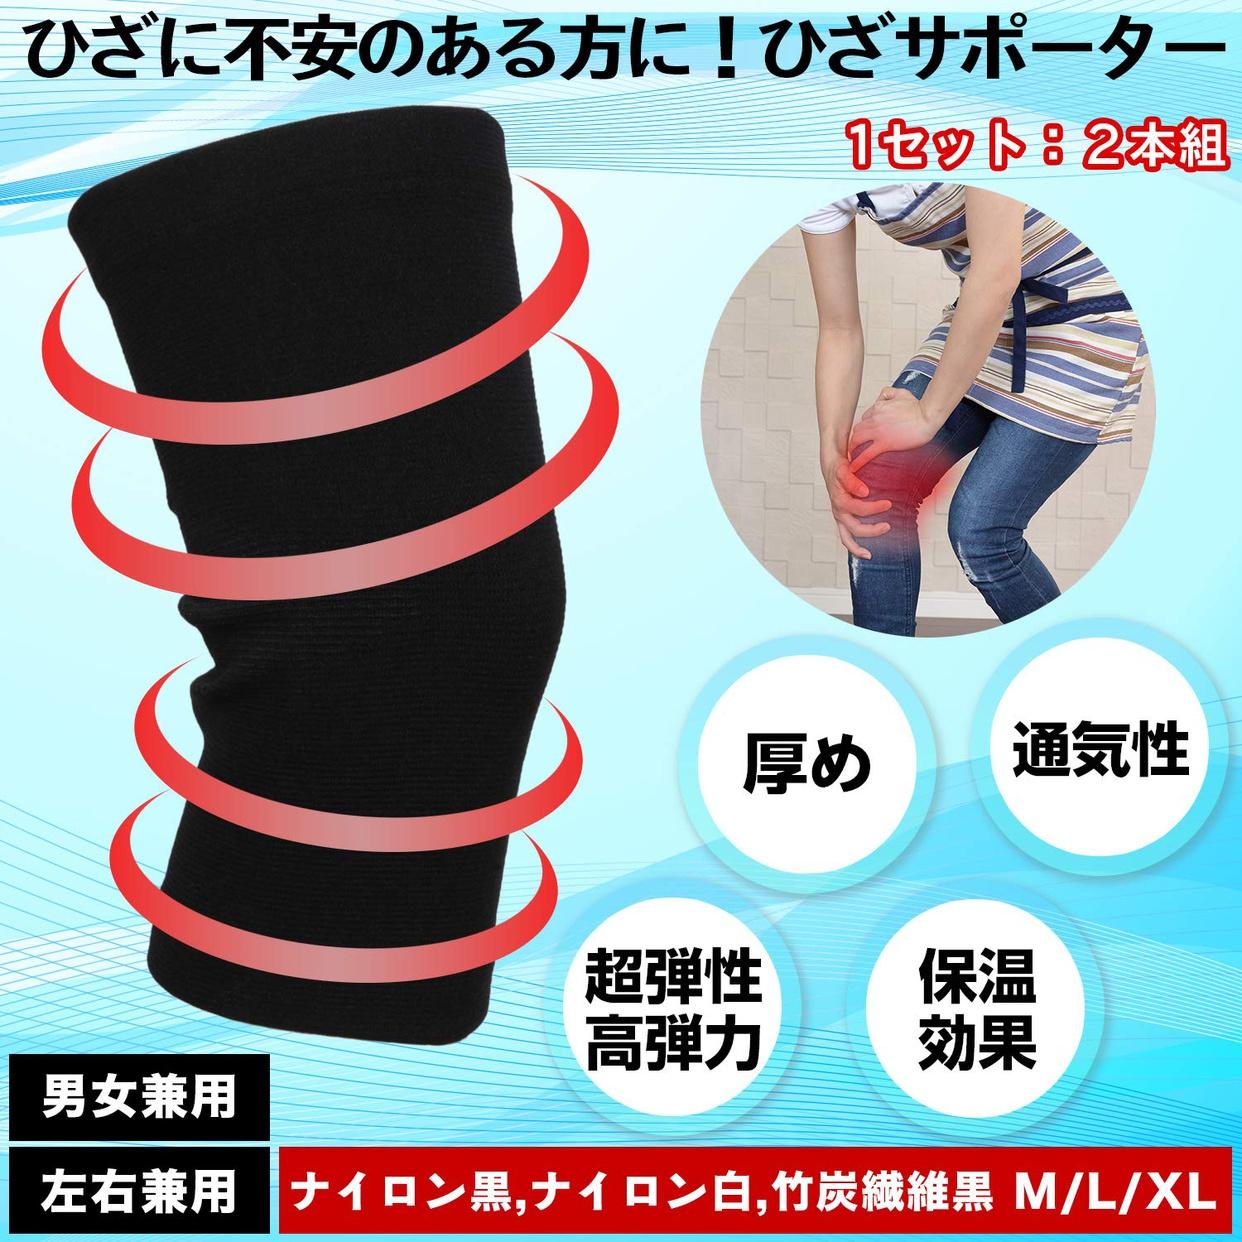 TOMOZONE(トモゾーン) 膝サポーター 両ヒザ用の商品画像2